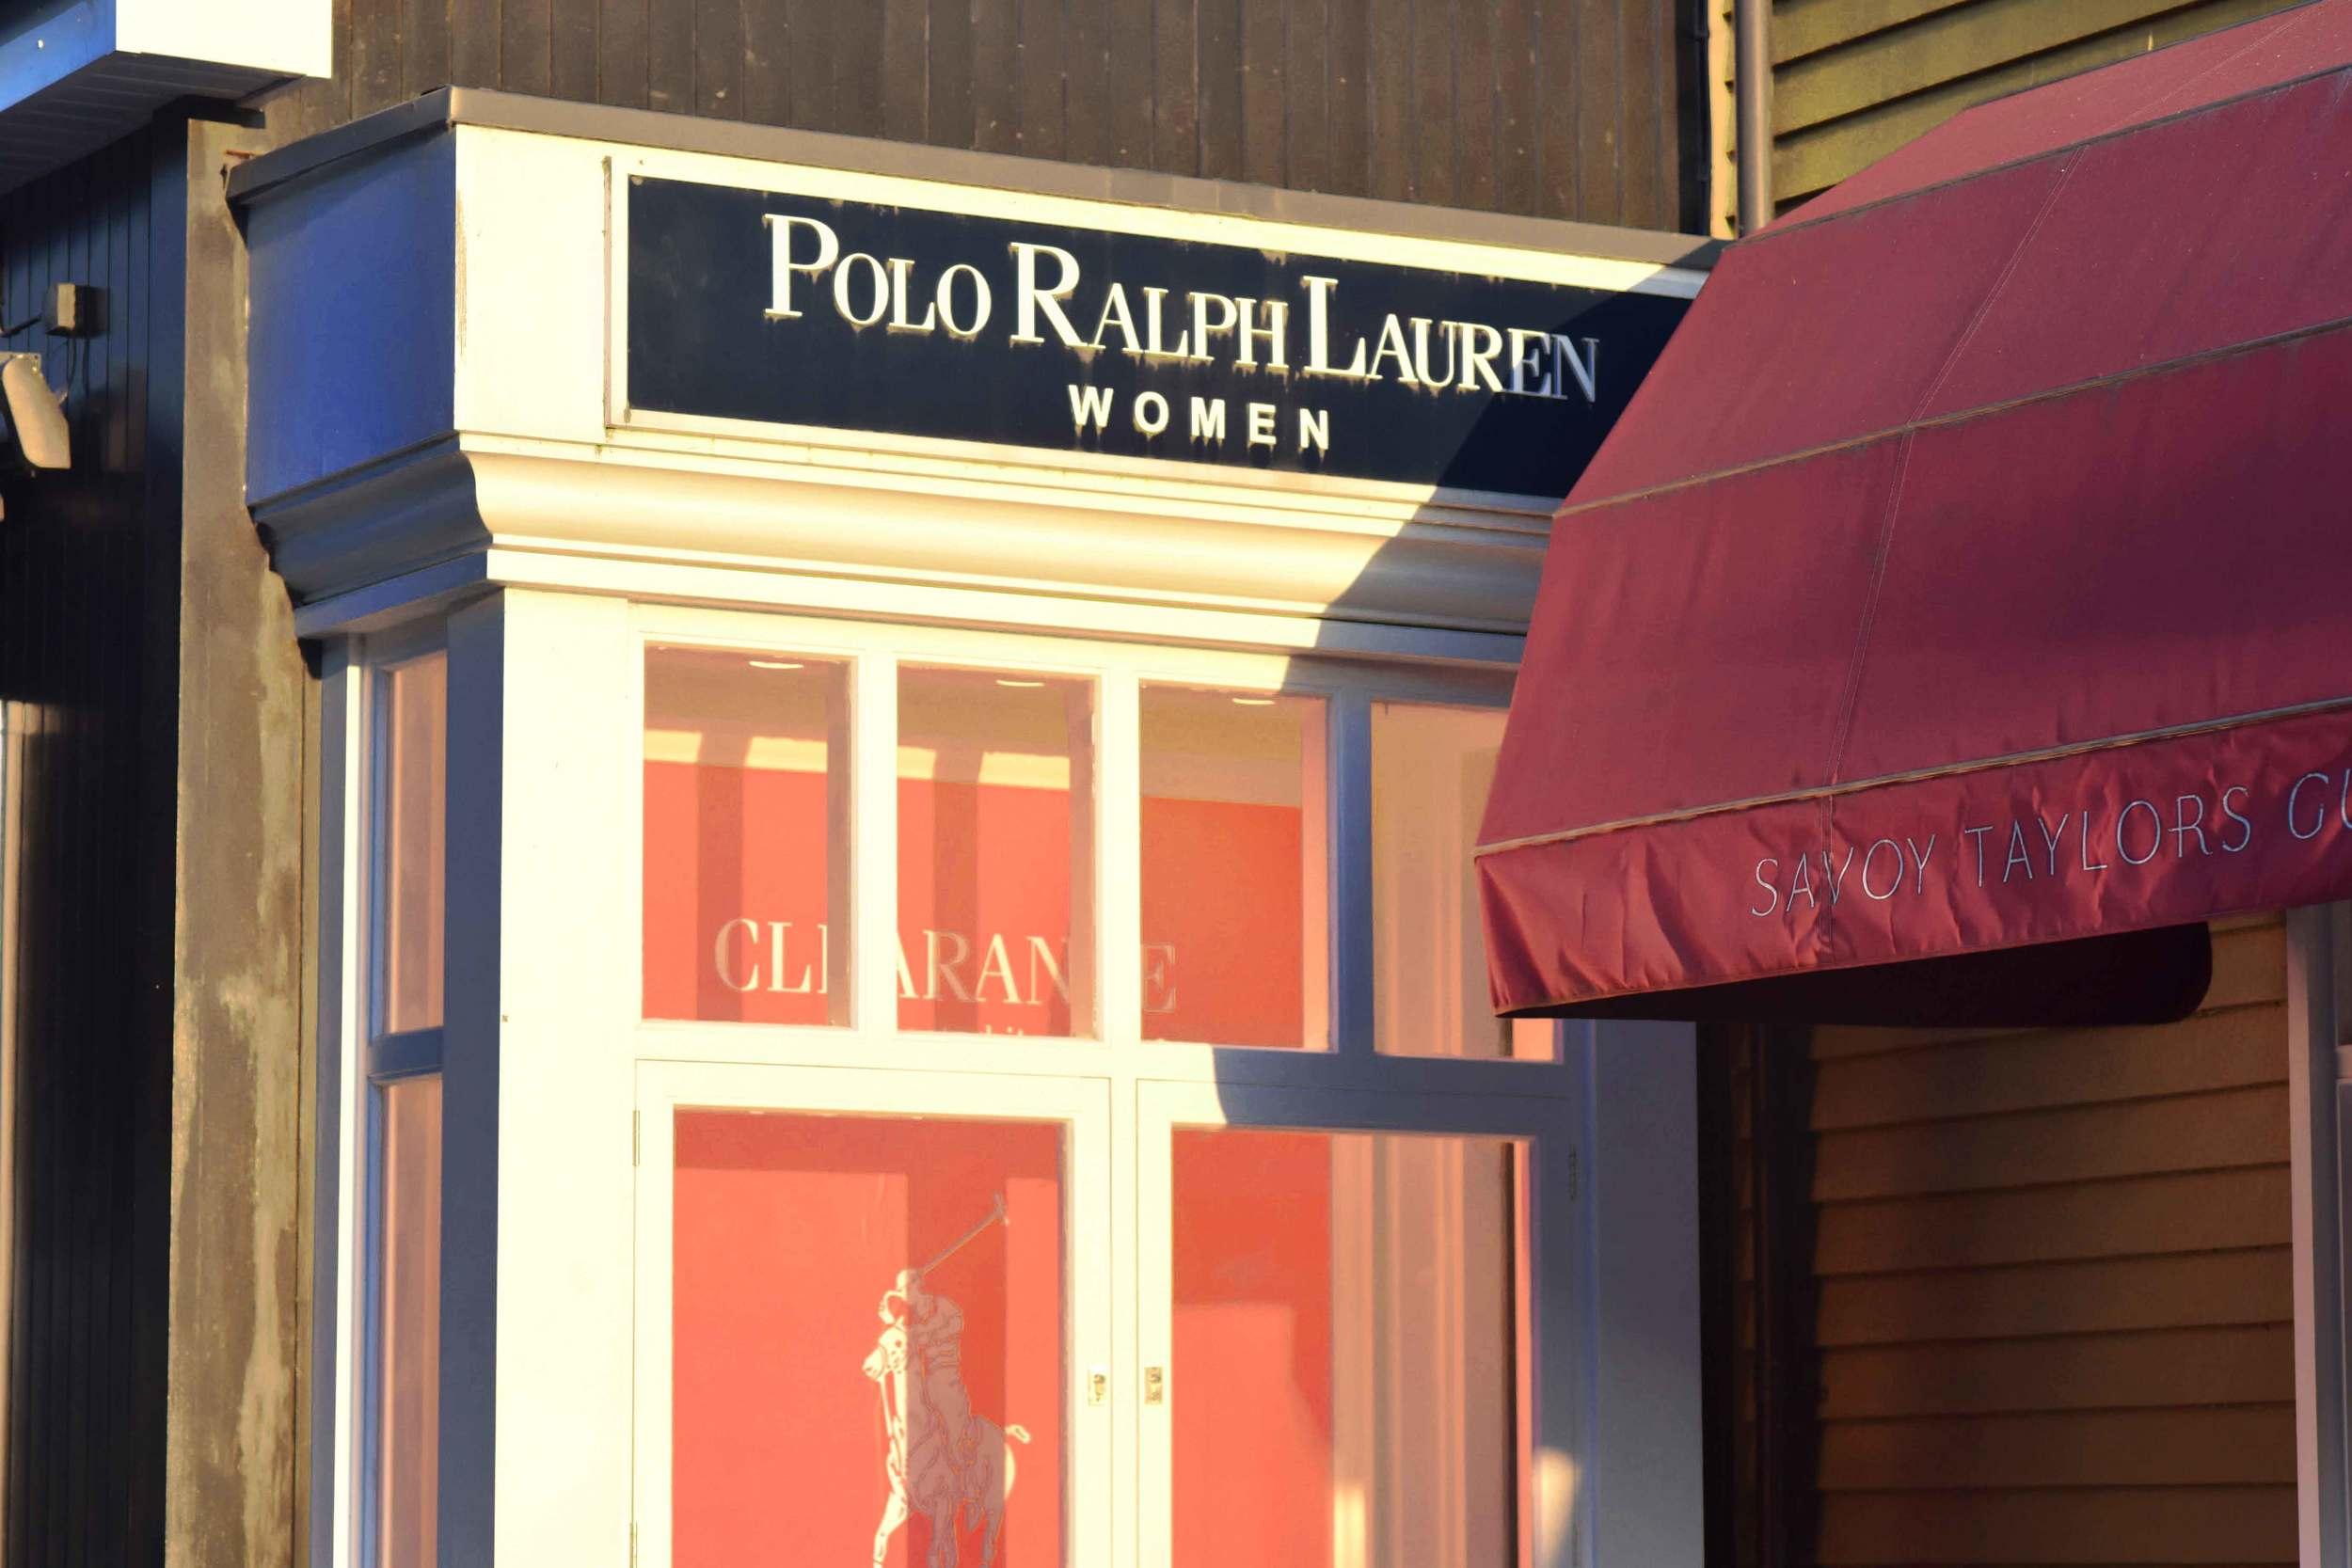 Polo Ralph Lauren, Bicester village, designer shopping outlet near London, UK. Image©sourcingstyle.com